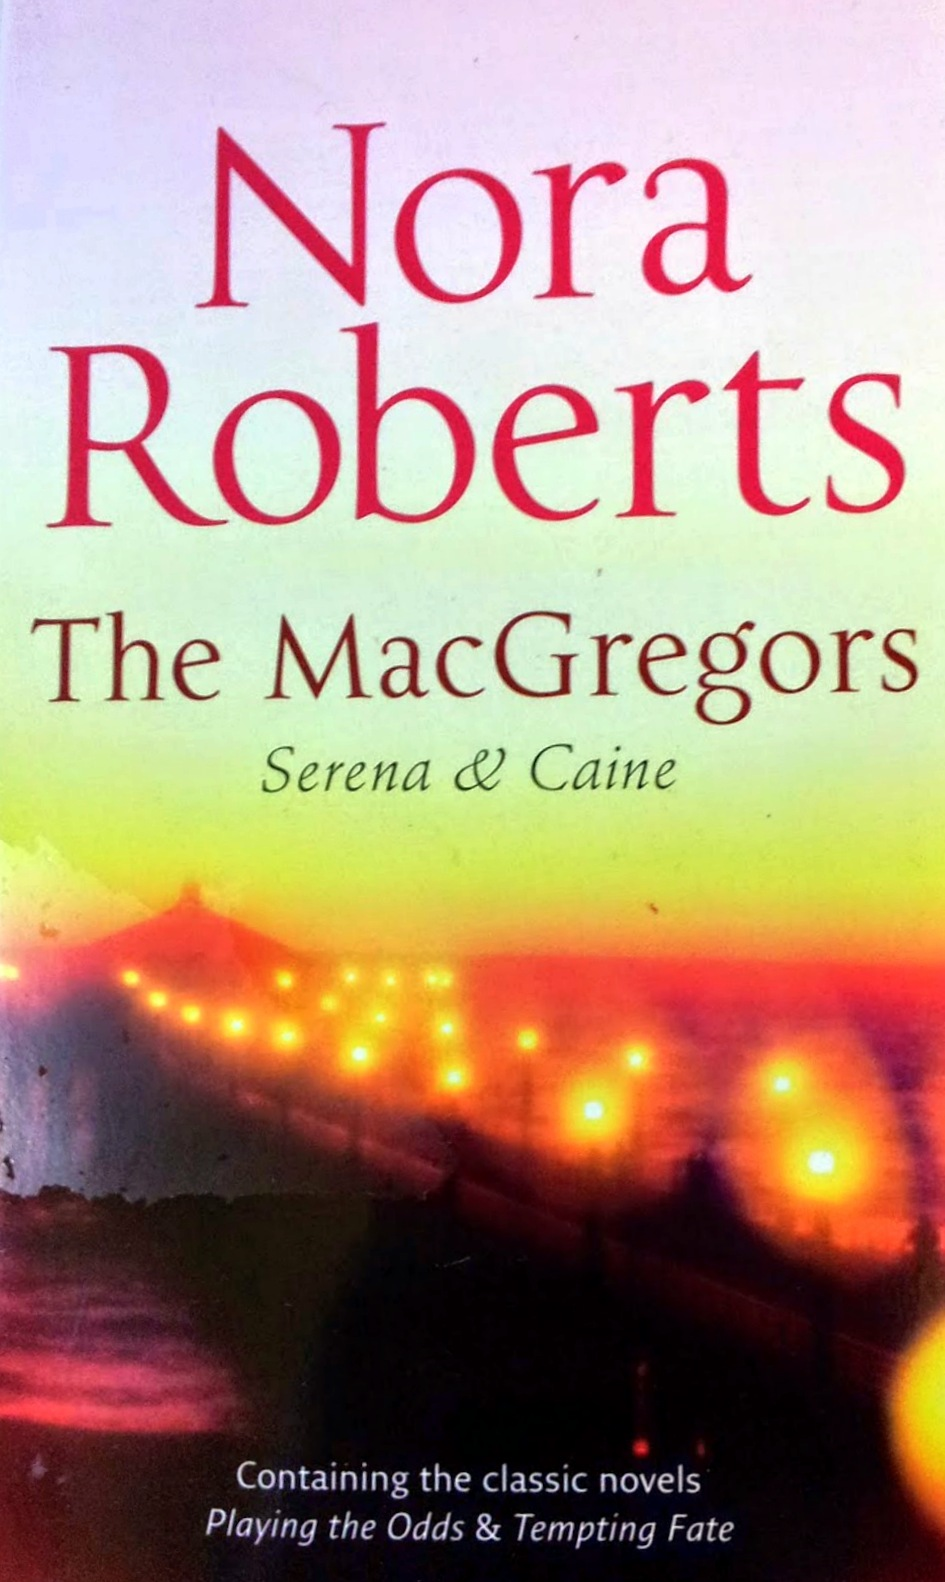 The Macgregors: Serena & Caine - The Macgregors # - Nora Roberts